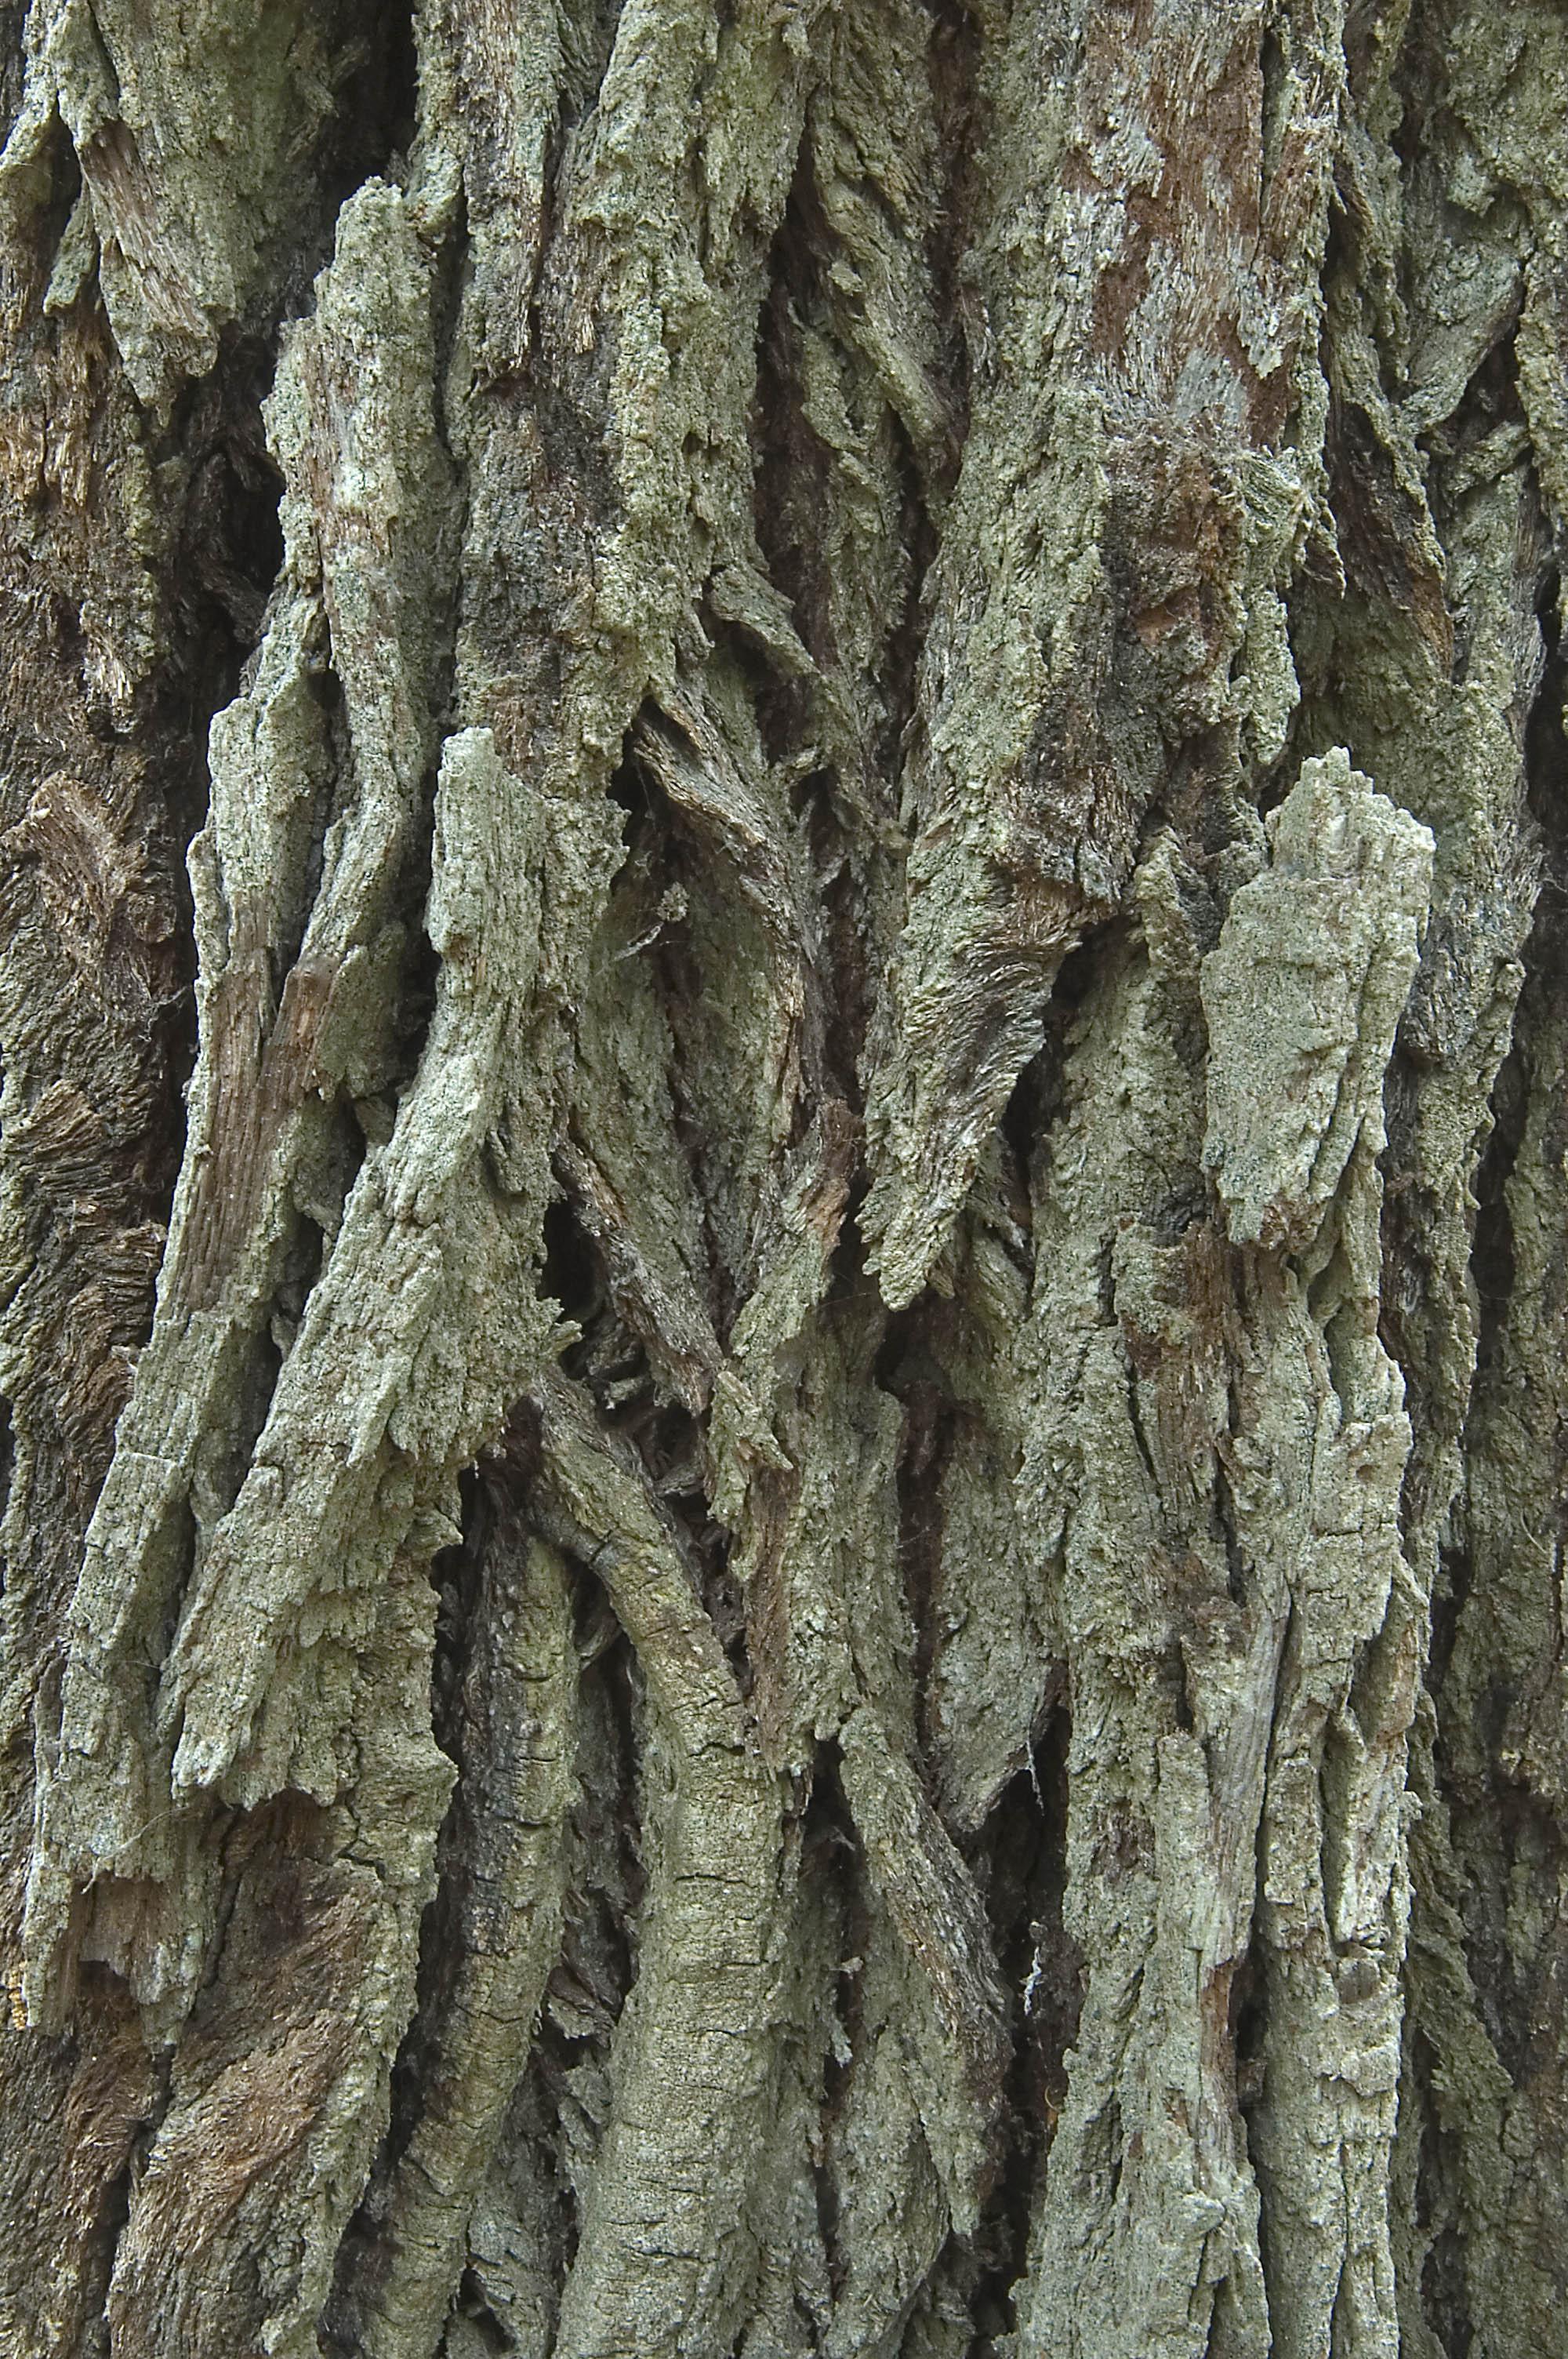 Photo 732 25 Bark Of An Oak Tree On Hoots Hollow Trail In